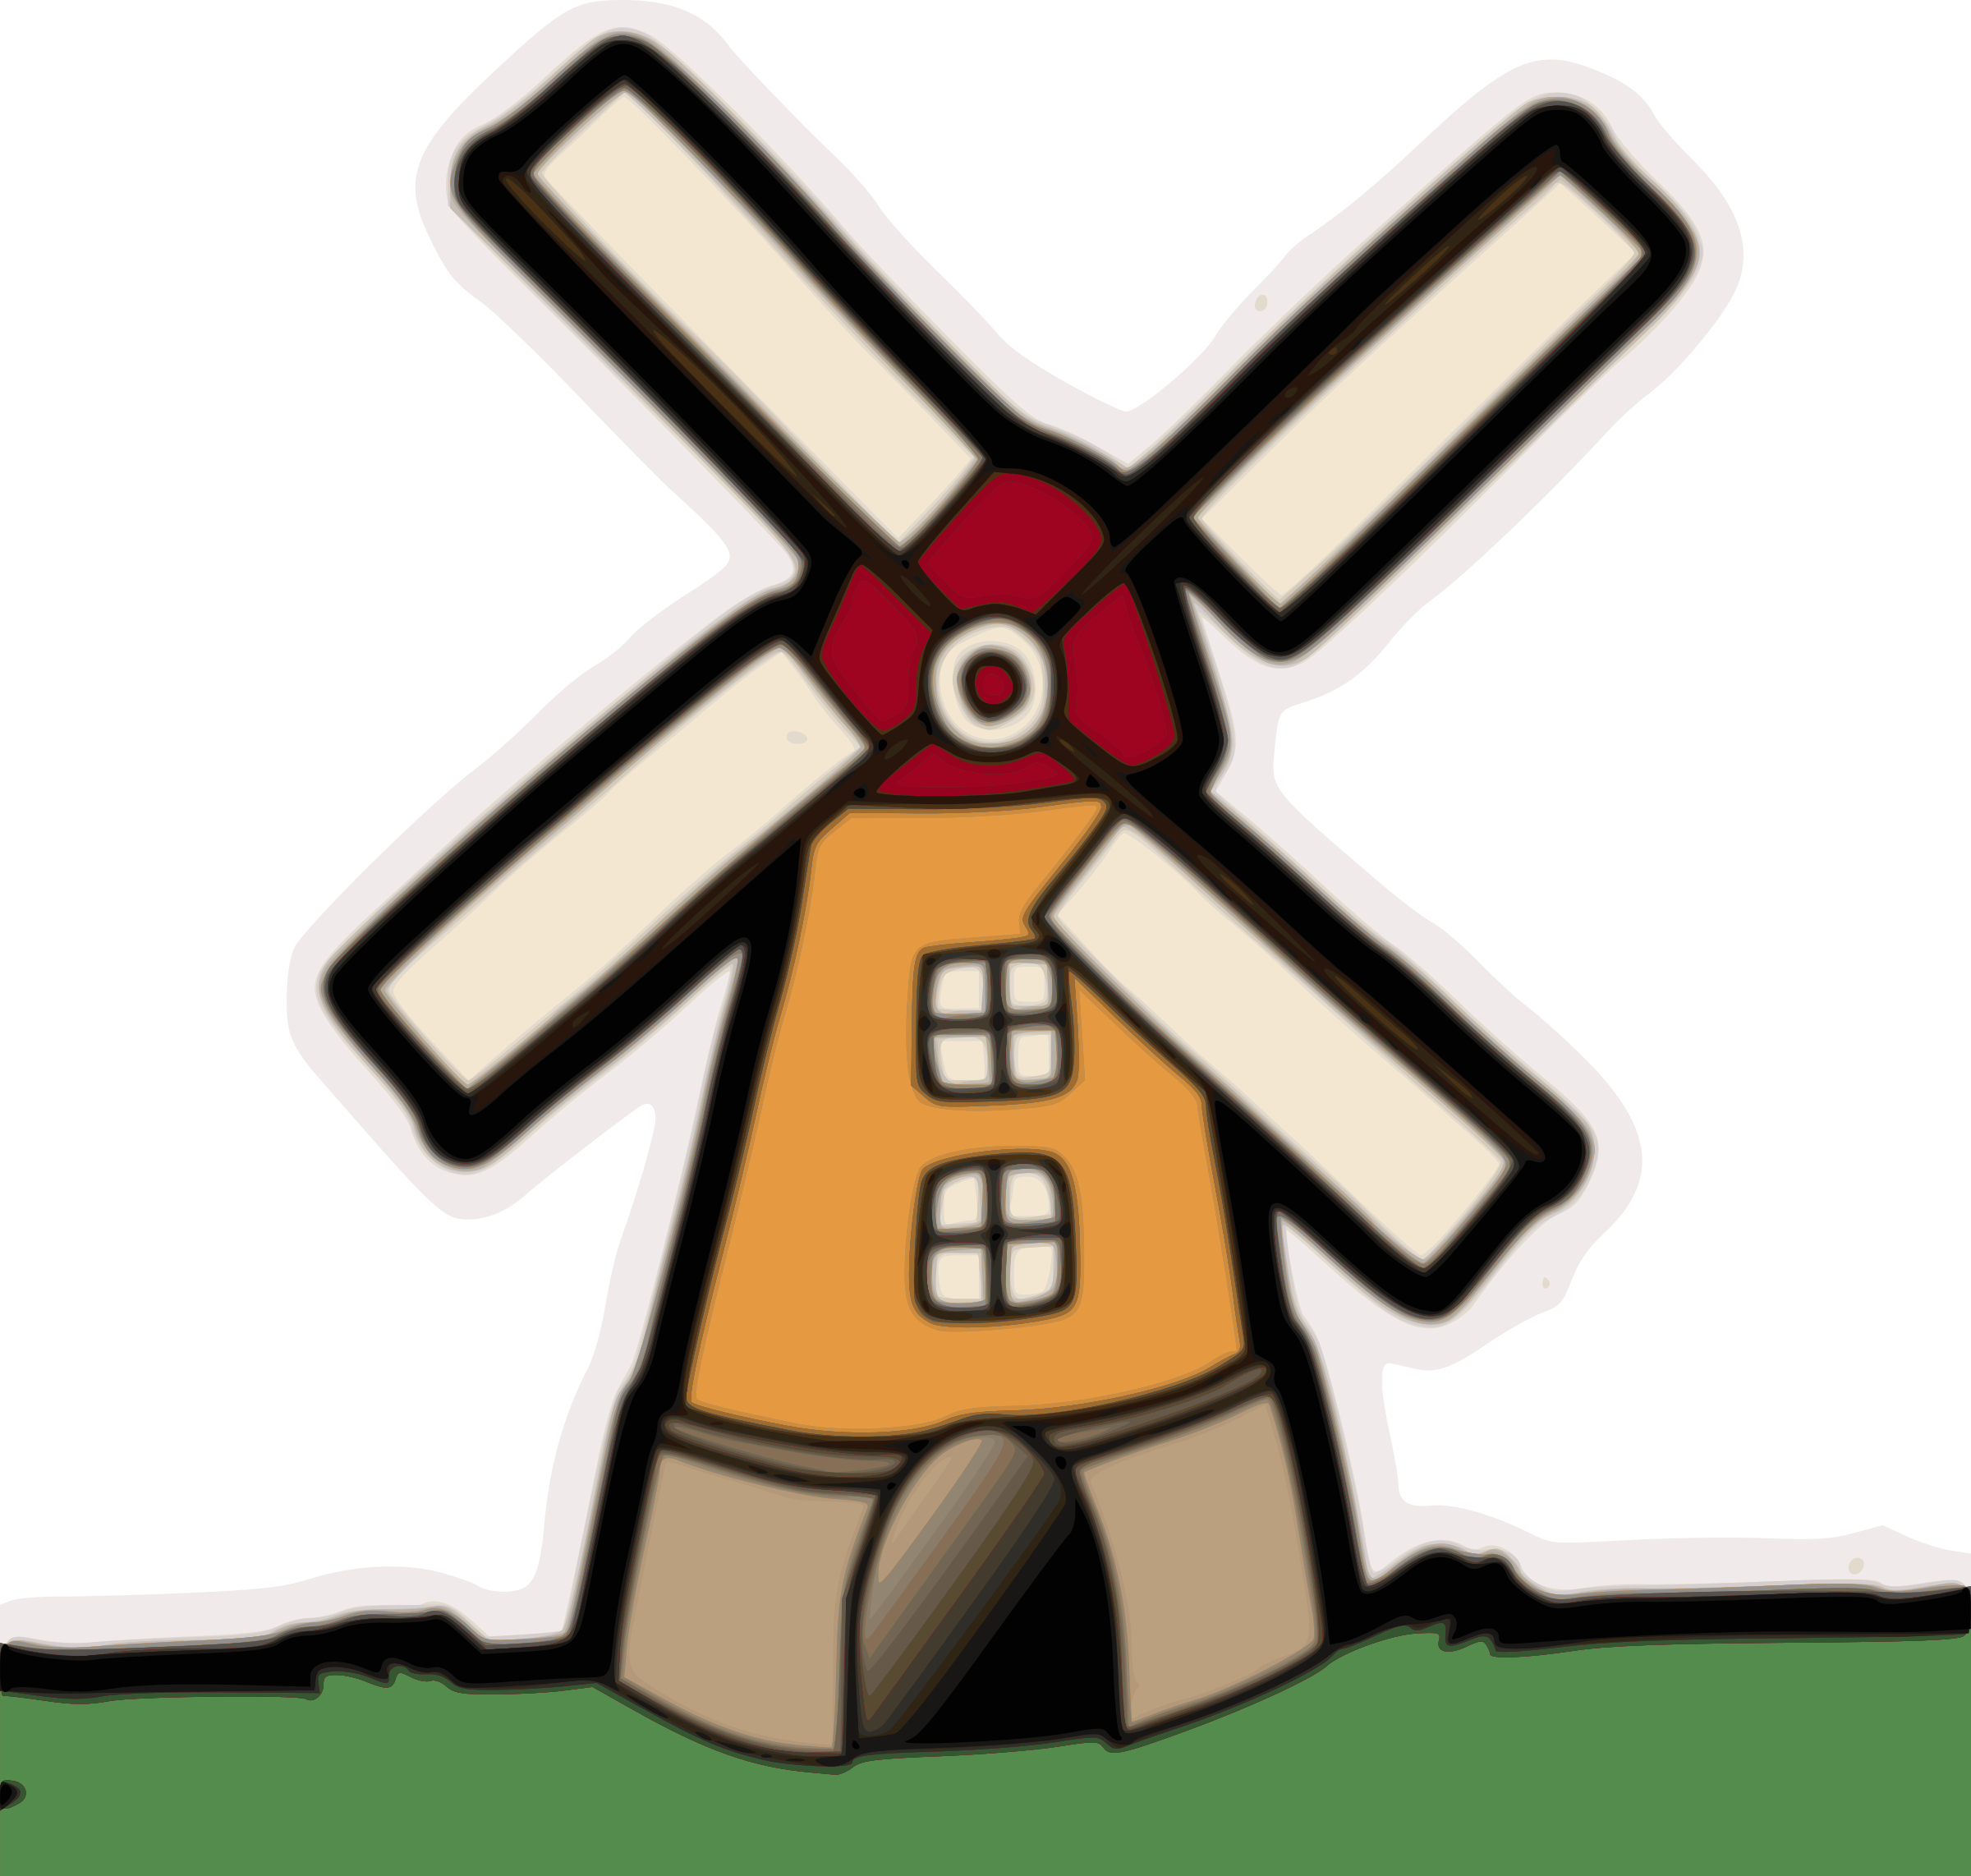 Windmill clipart Windmill Windmill Clipart